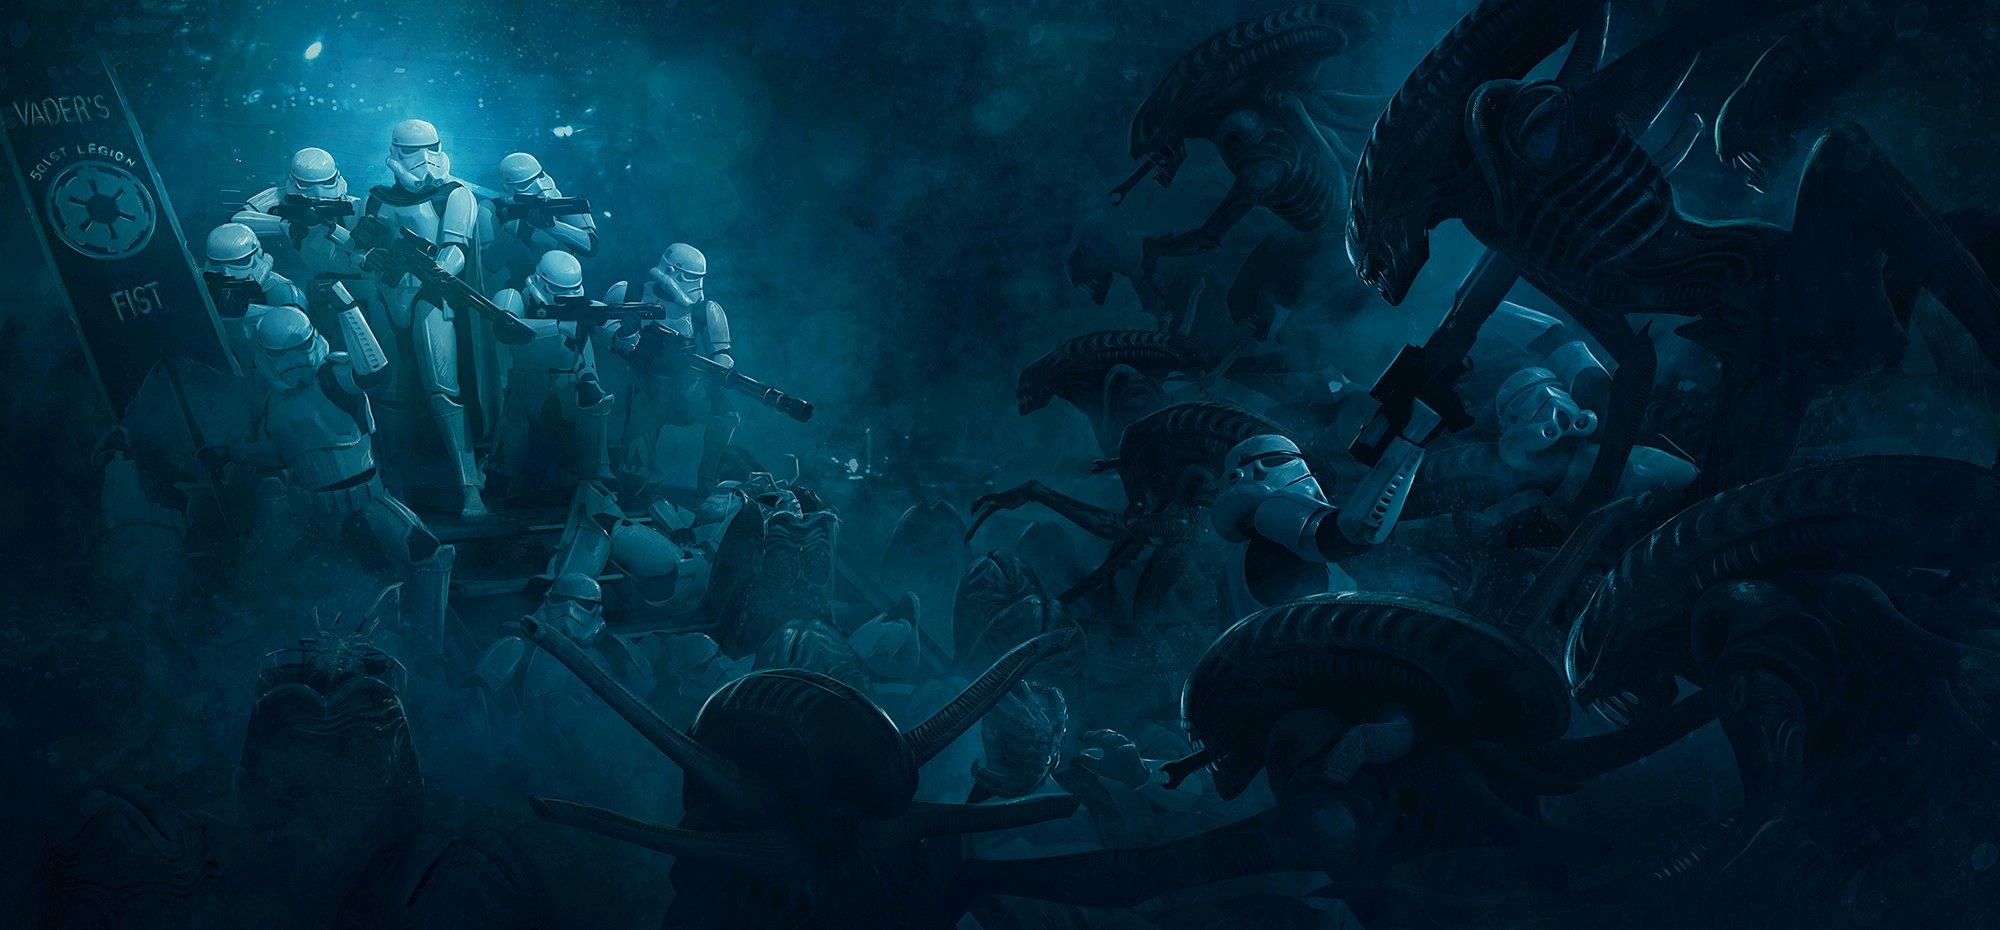 guillemhp_501_legion_stormtroopers_vs_aliens.jpg